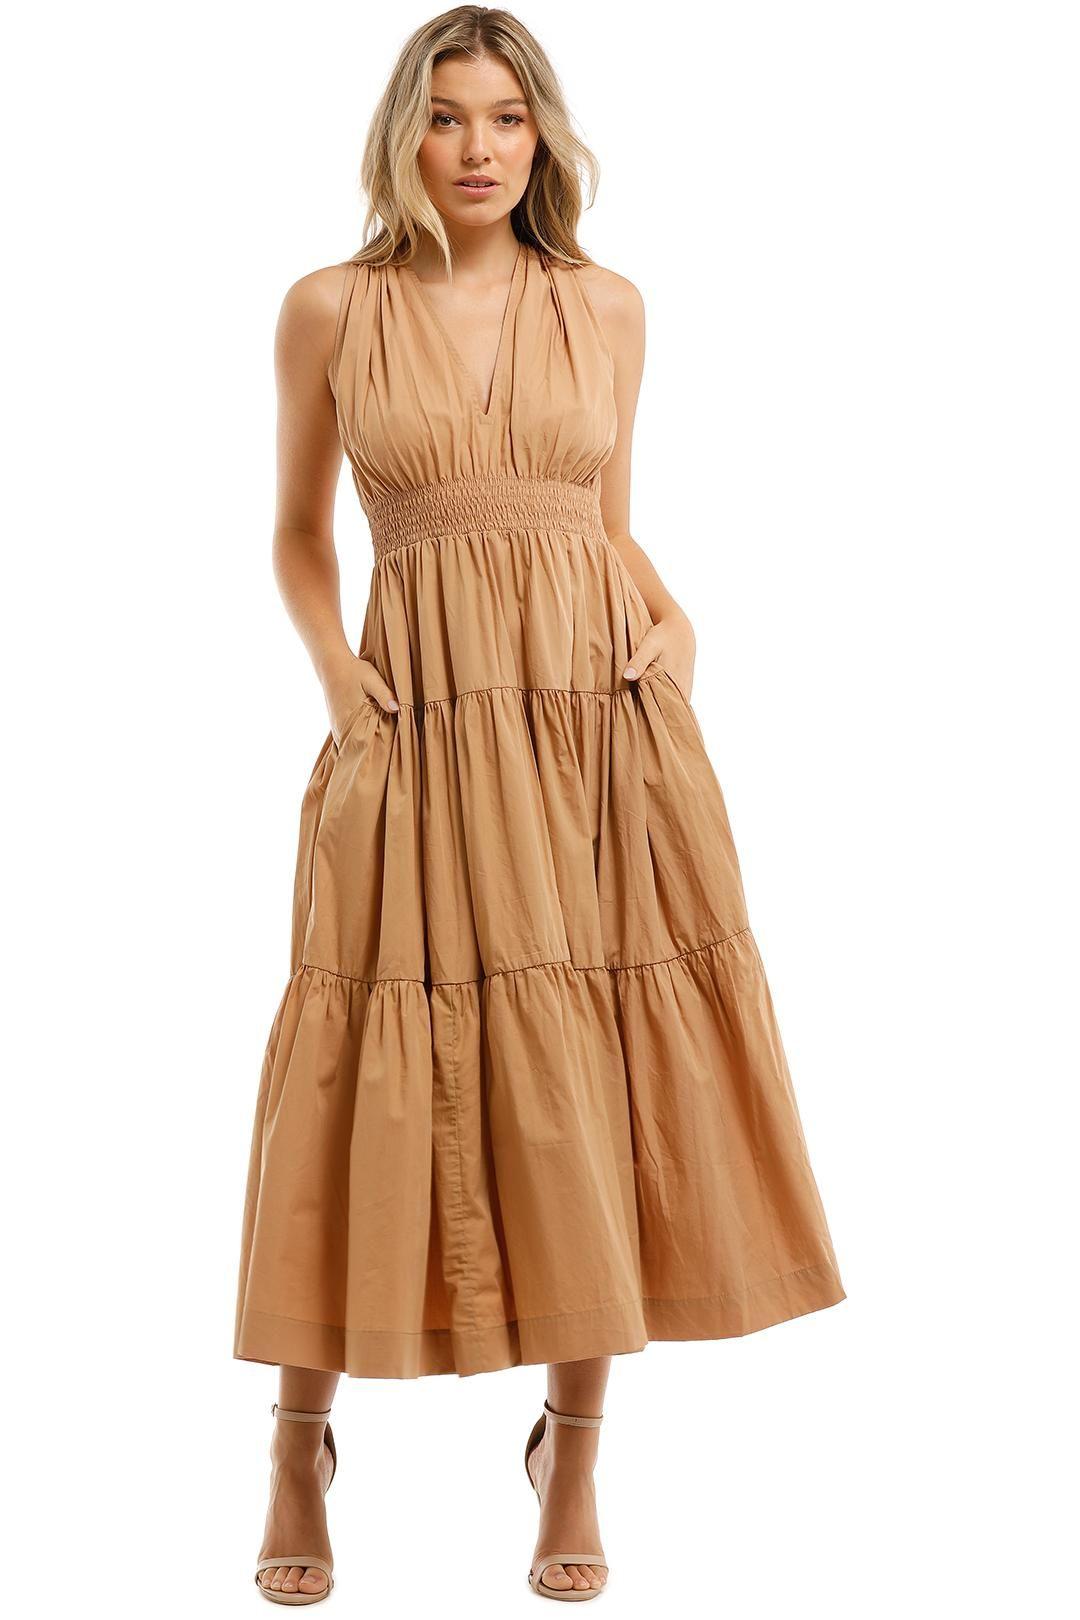 SWF Tiered Maxi Dress Brown Shirred